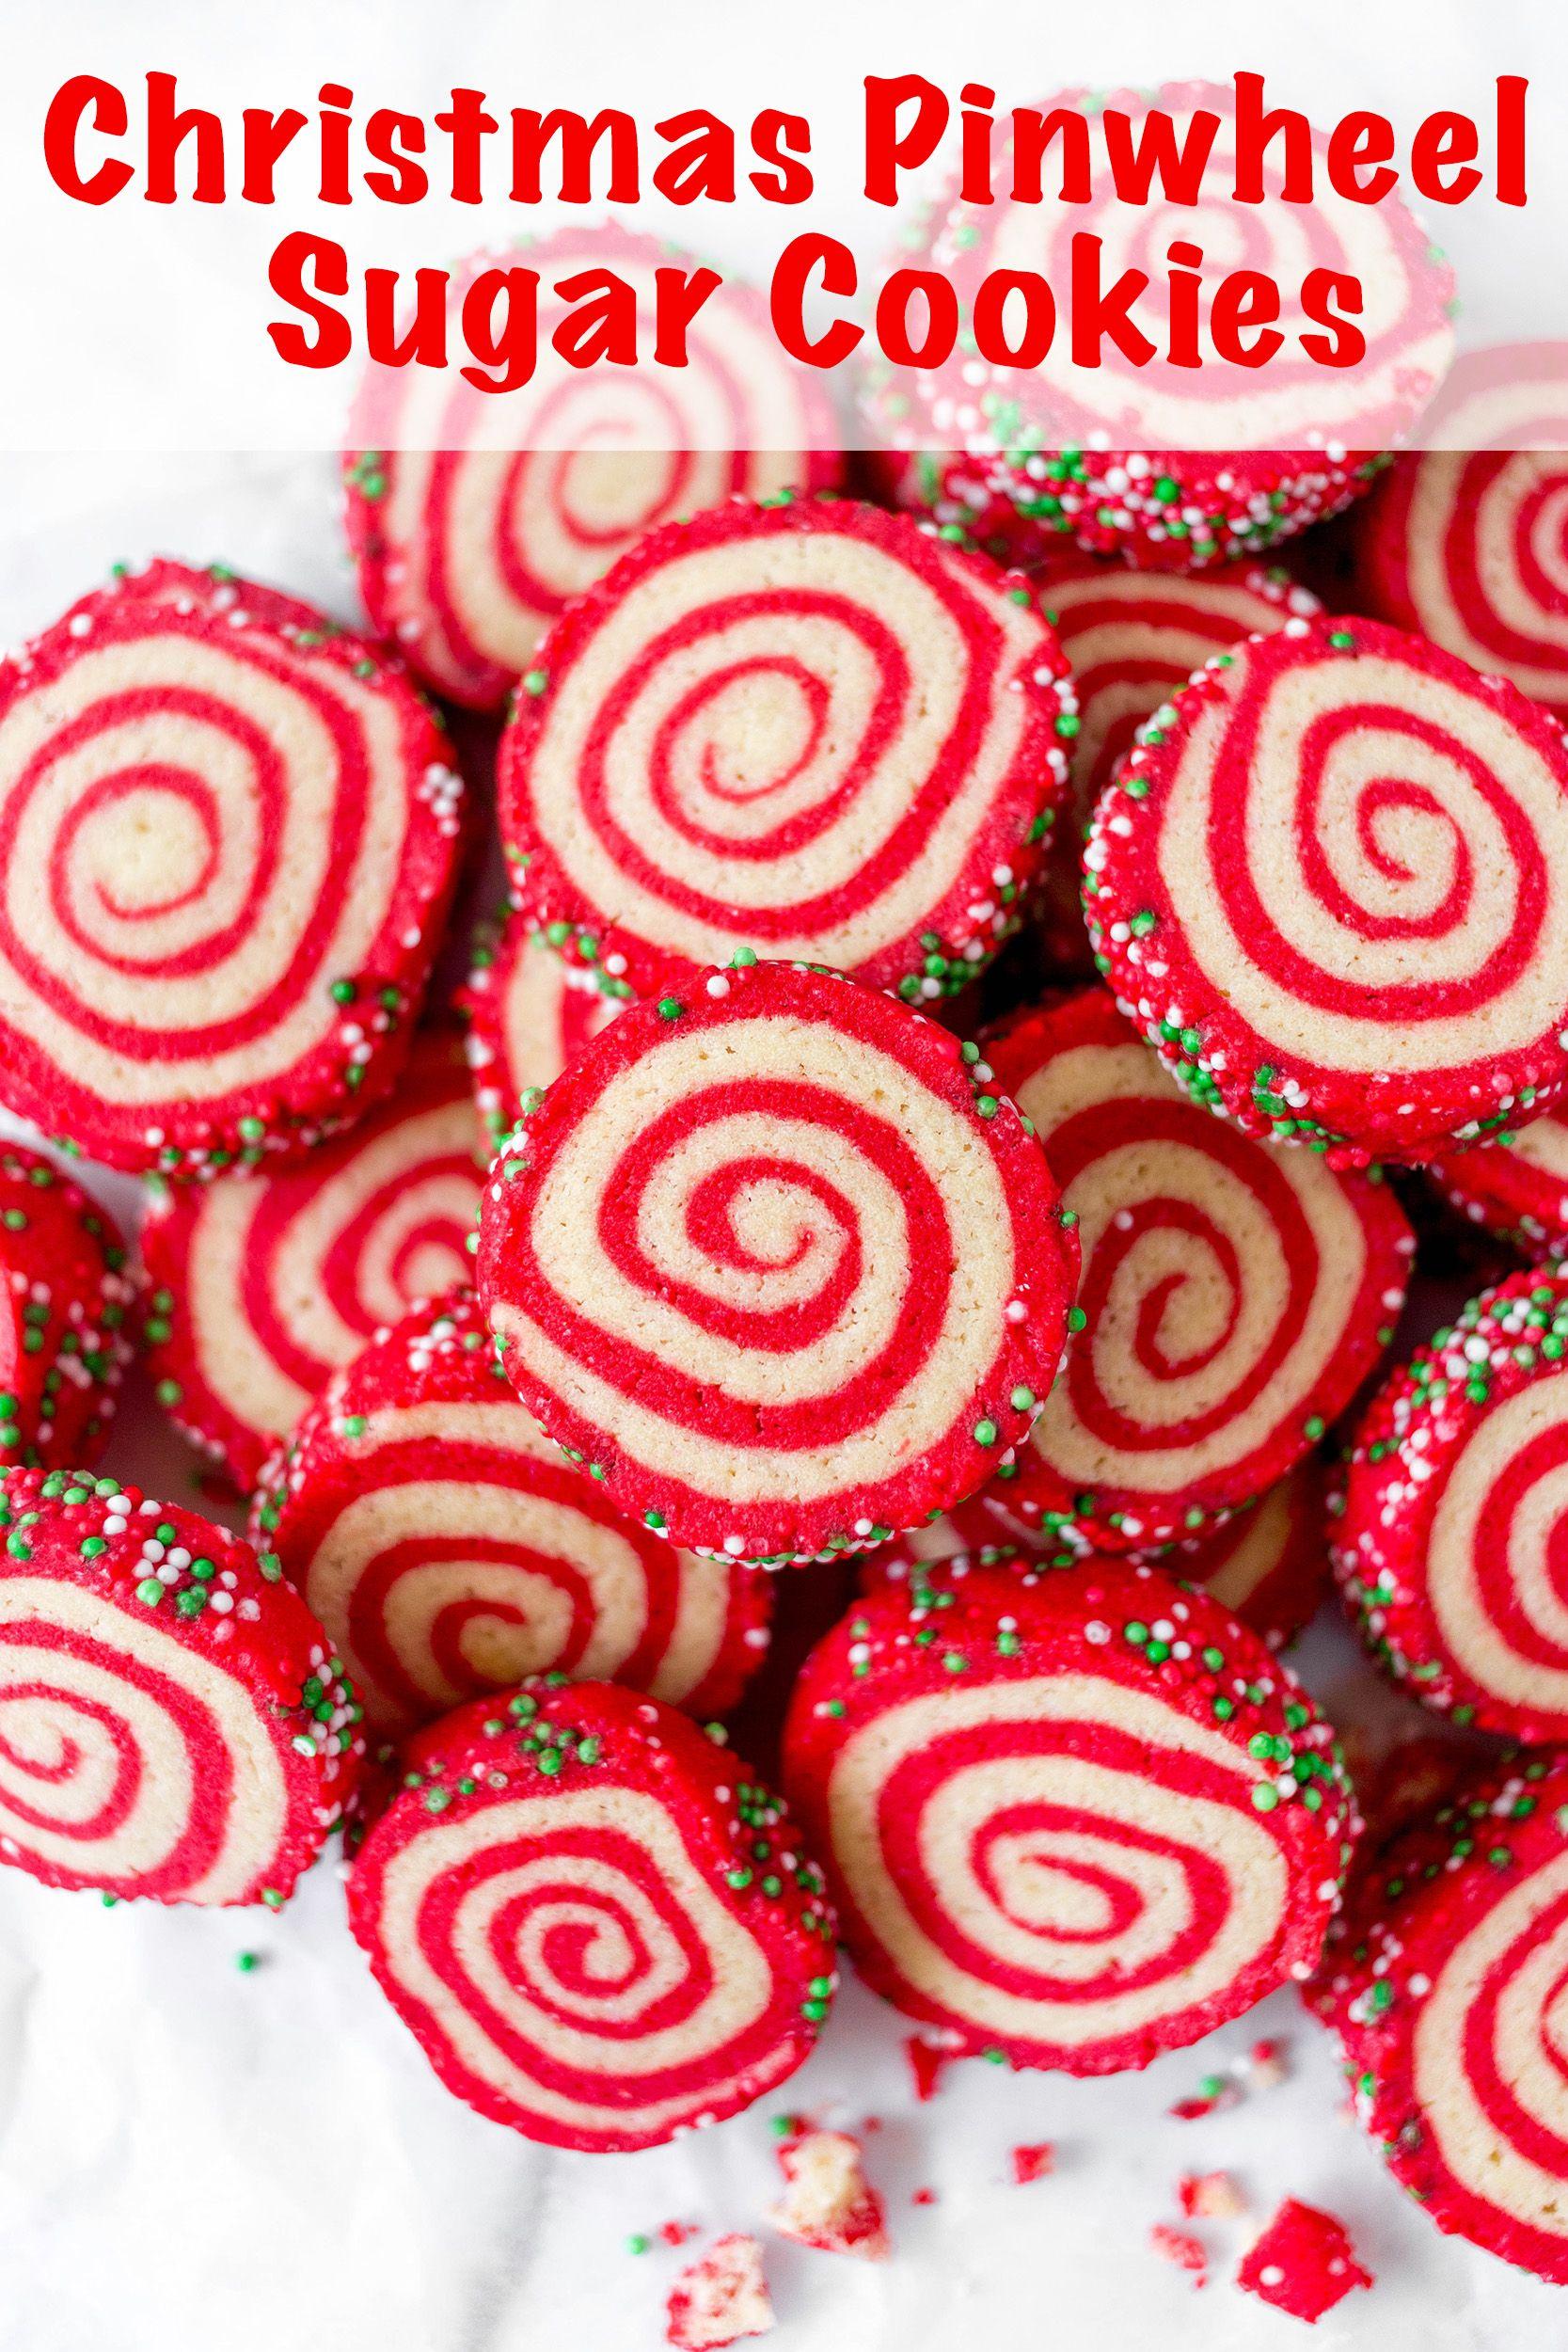 Dec 20 Christmas Pinwheel Sugar Cookies Lip Smacking Food From